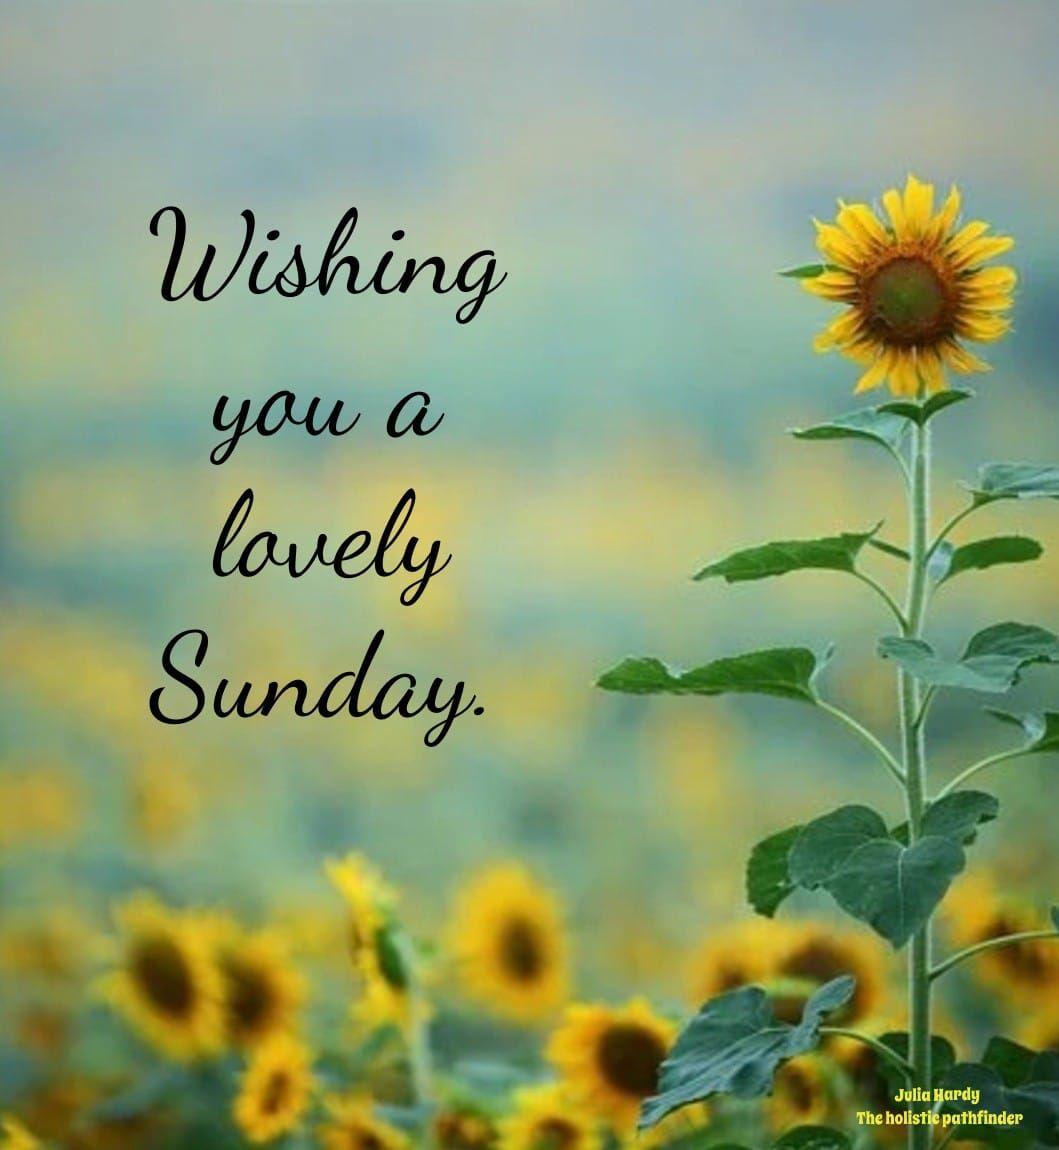 Wishing you a lovely Sunday